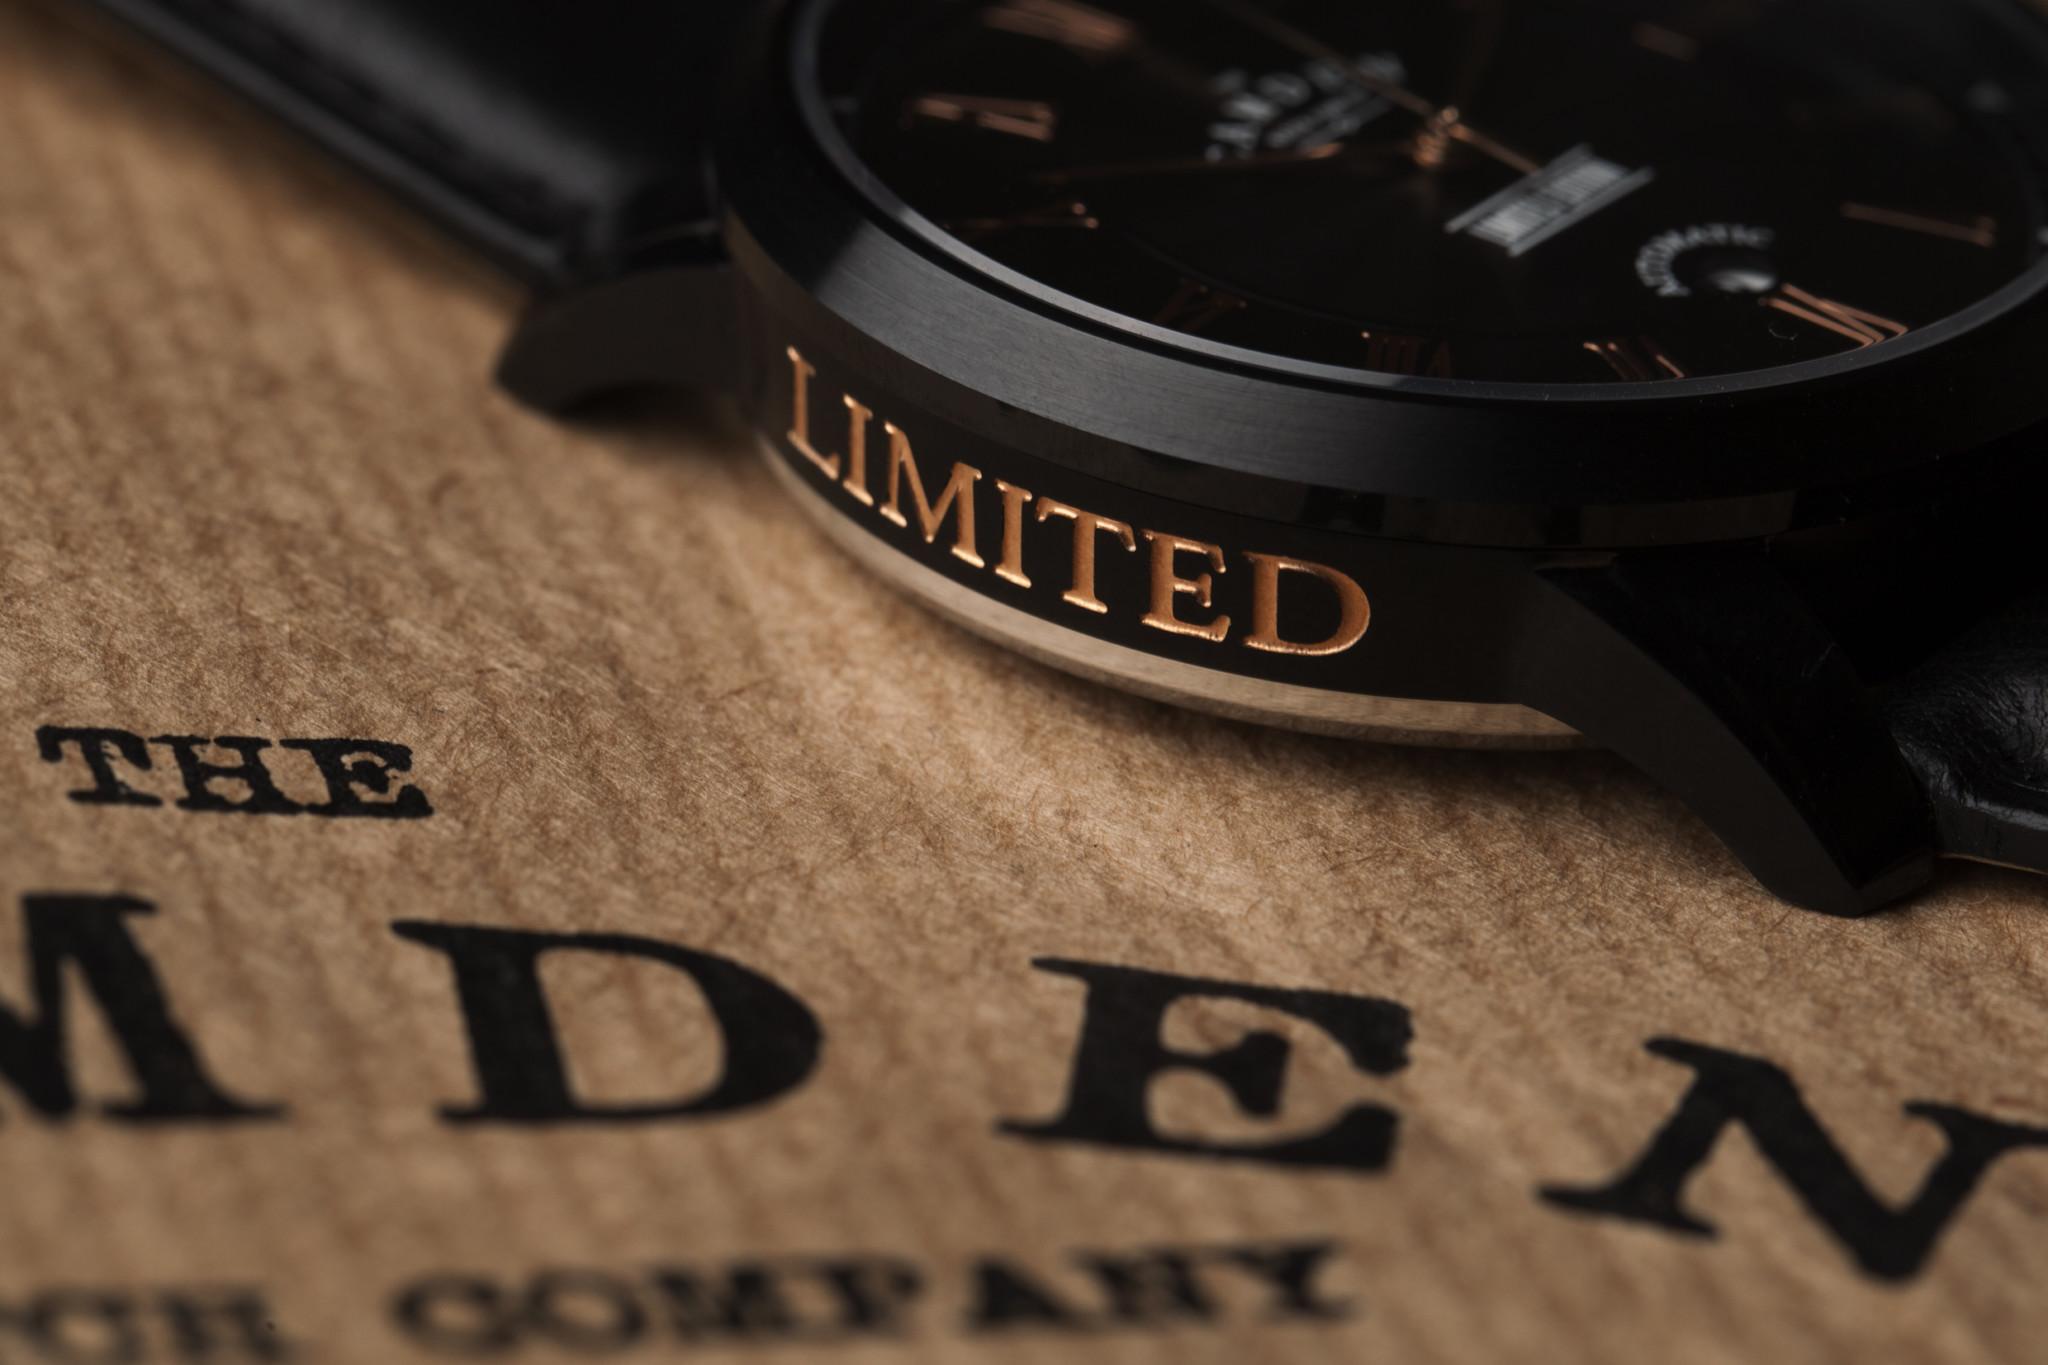 Camden Watch Company Limited Kickstarter Edition 2